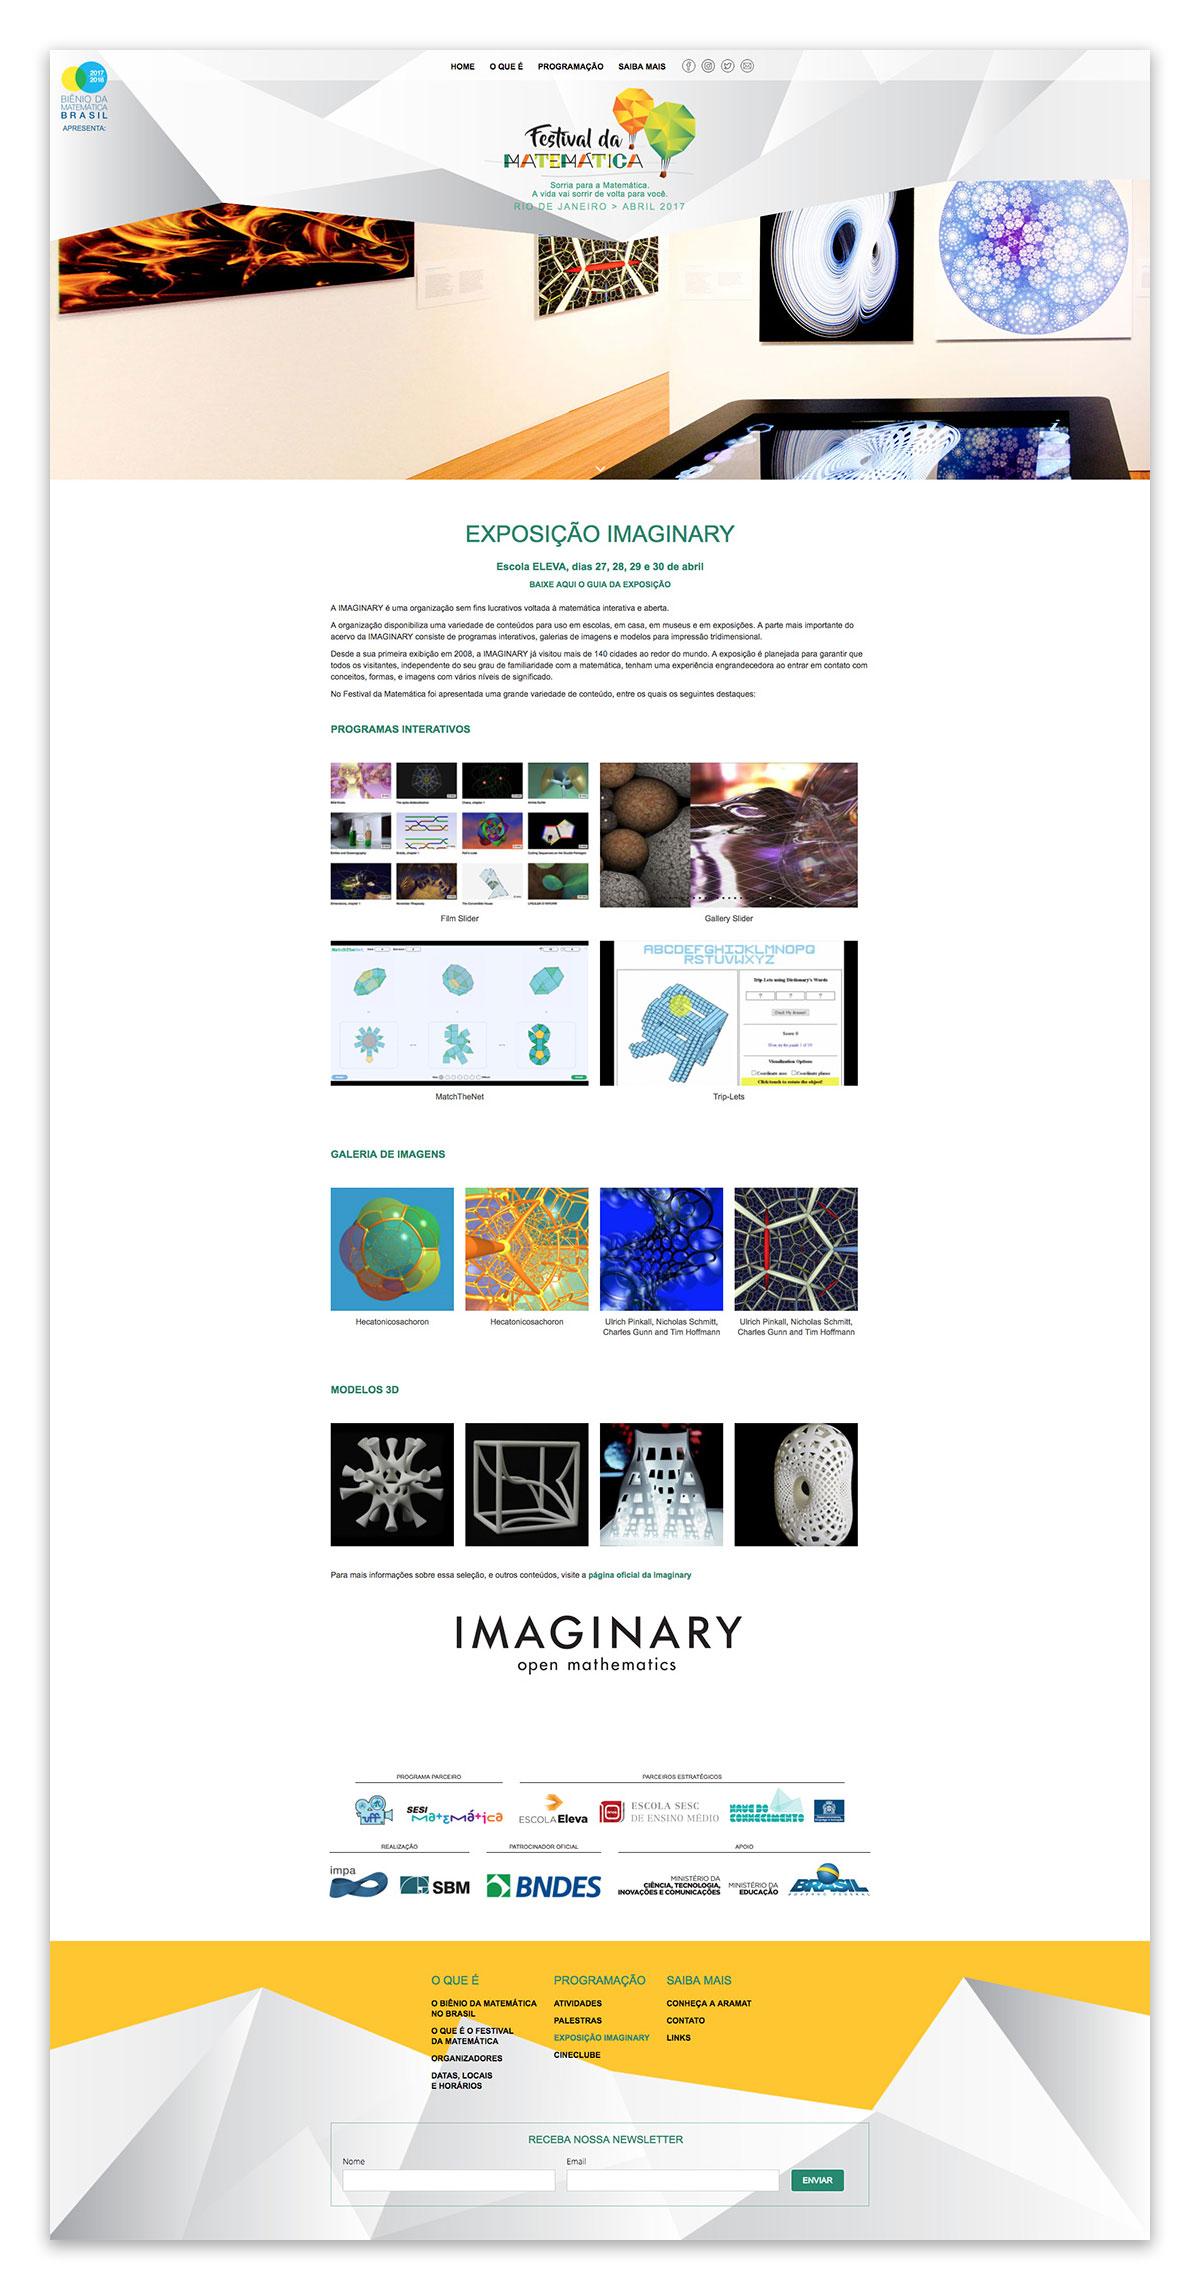 screencapture-festivaldamatematica-org-br-programacao-imaginary-1518591968216.jpg